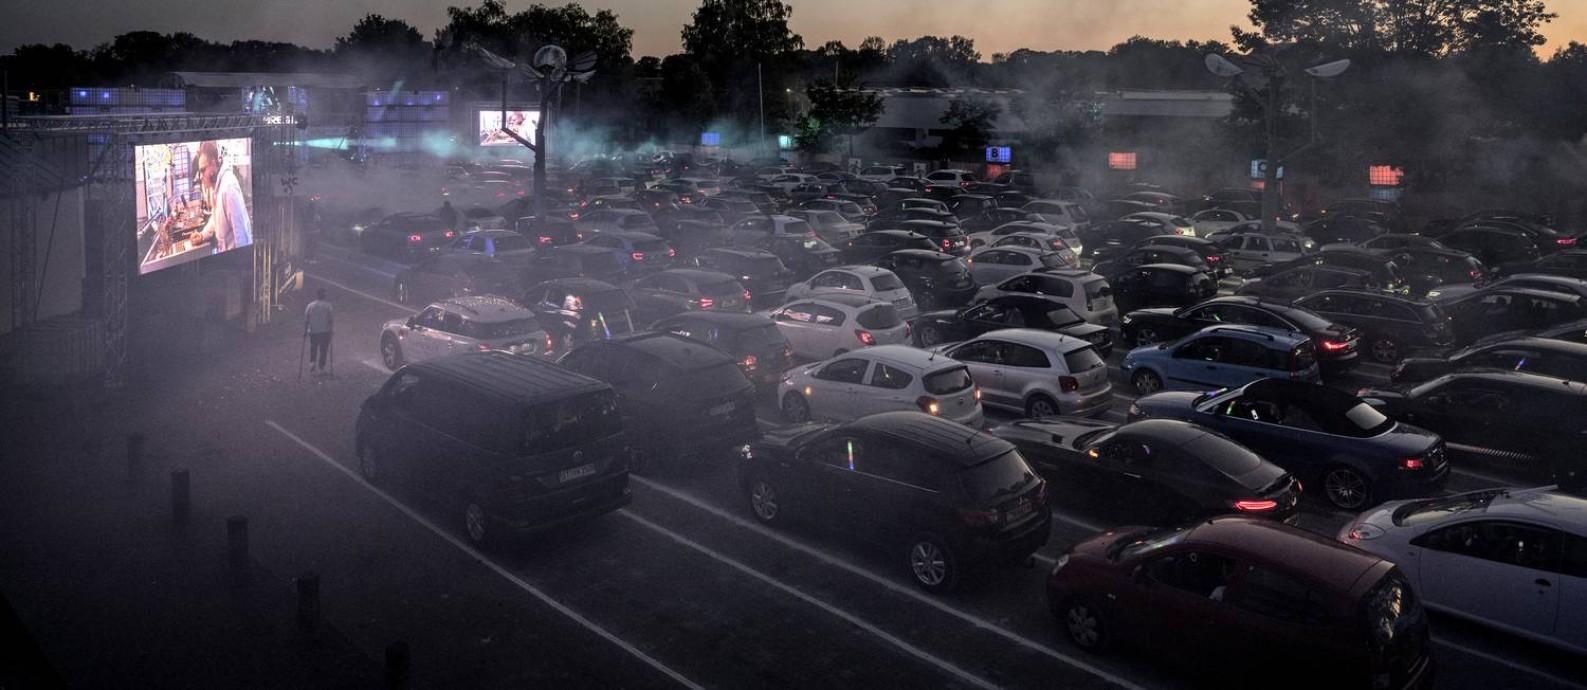 Show em sistema de drive-in em Schüttorf, na Alemanha Foto: Laetitia Vancon/The New York Times / O GLOBO